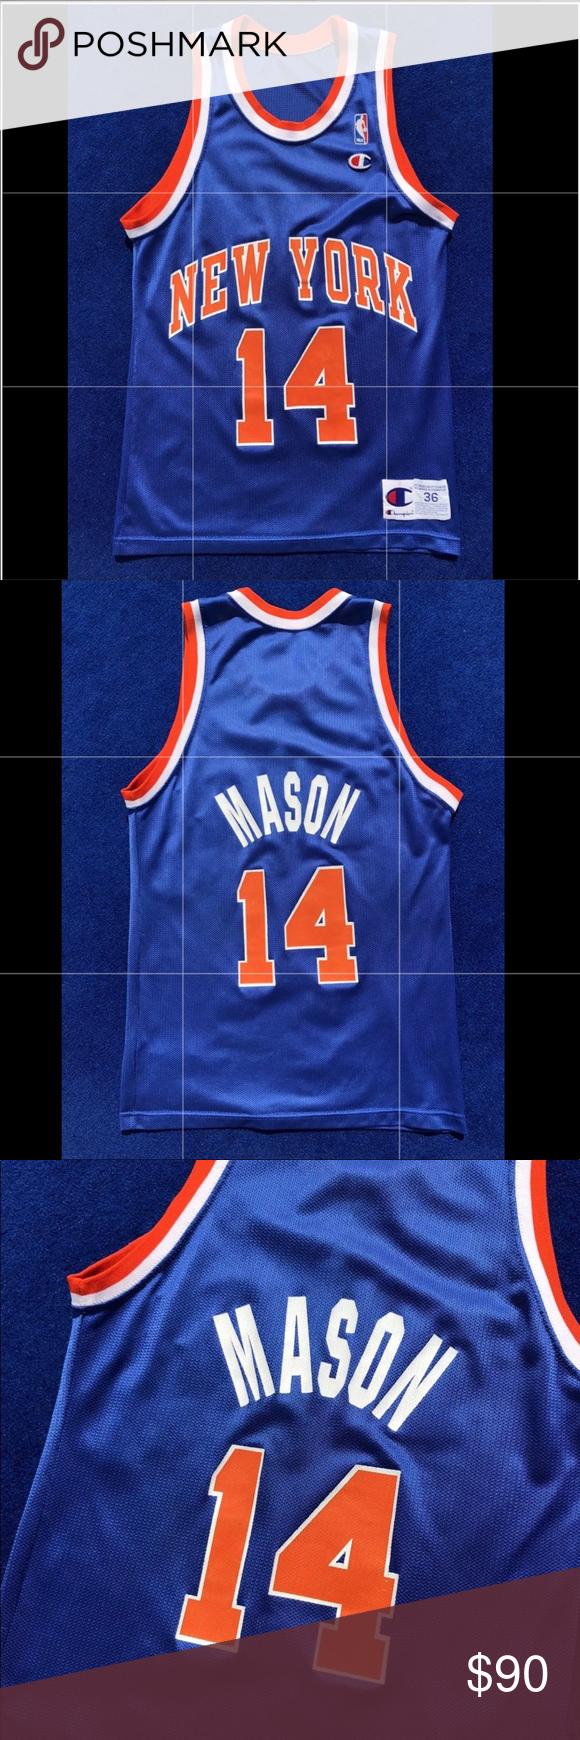 buy popular 88abe 79936 Vintage New York Knicks Anthony Mason Jersey 90s Vintage New ...